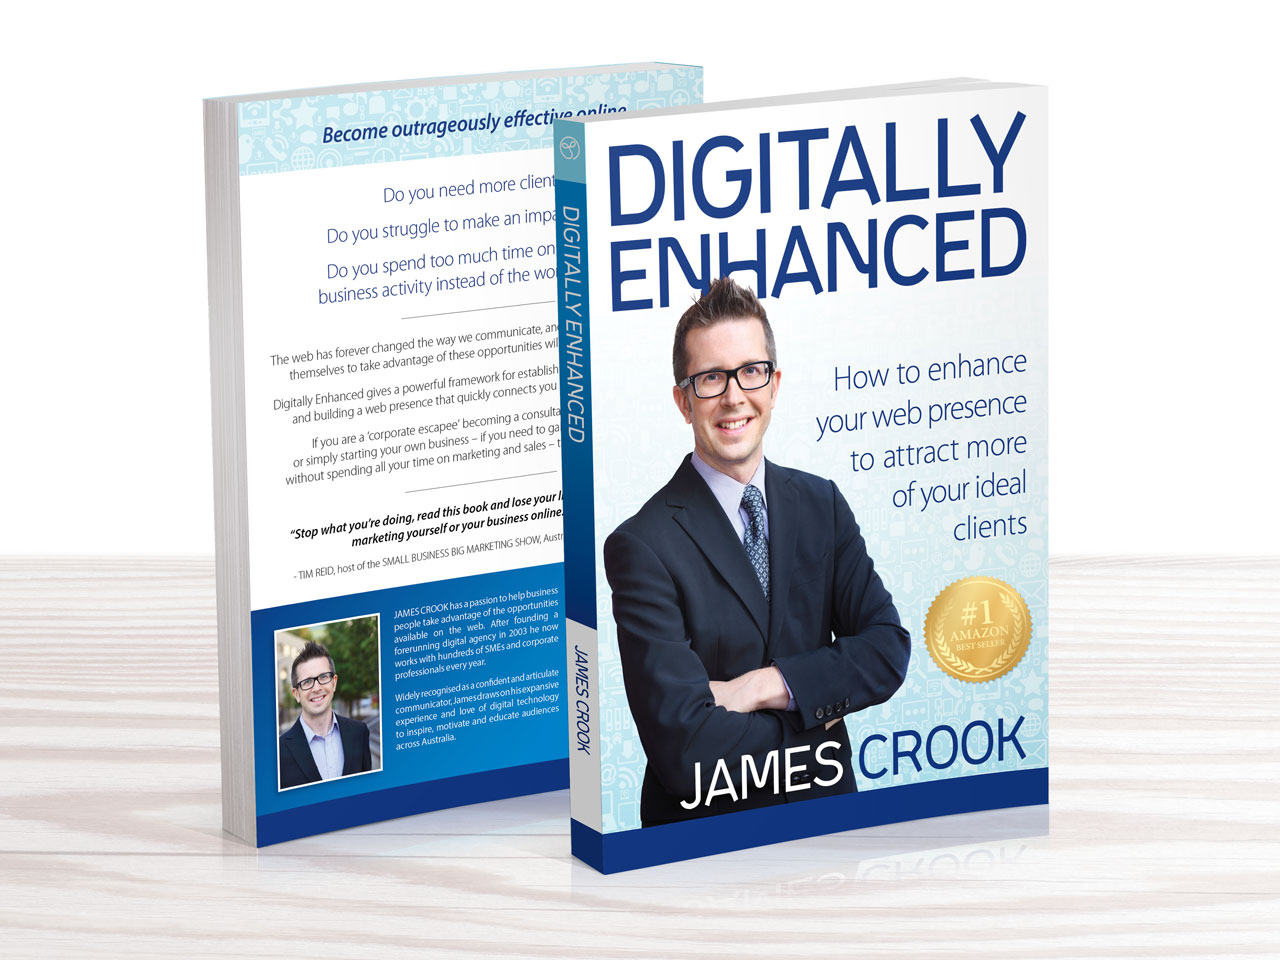 JAMES CROOK - Digitally Enhanced Book Design Morrison Design, Graphic Design and Branding Agency Geelong, Melbourne, VIC.